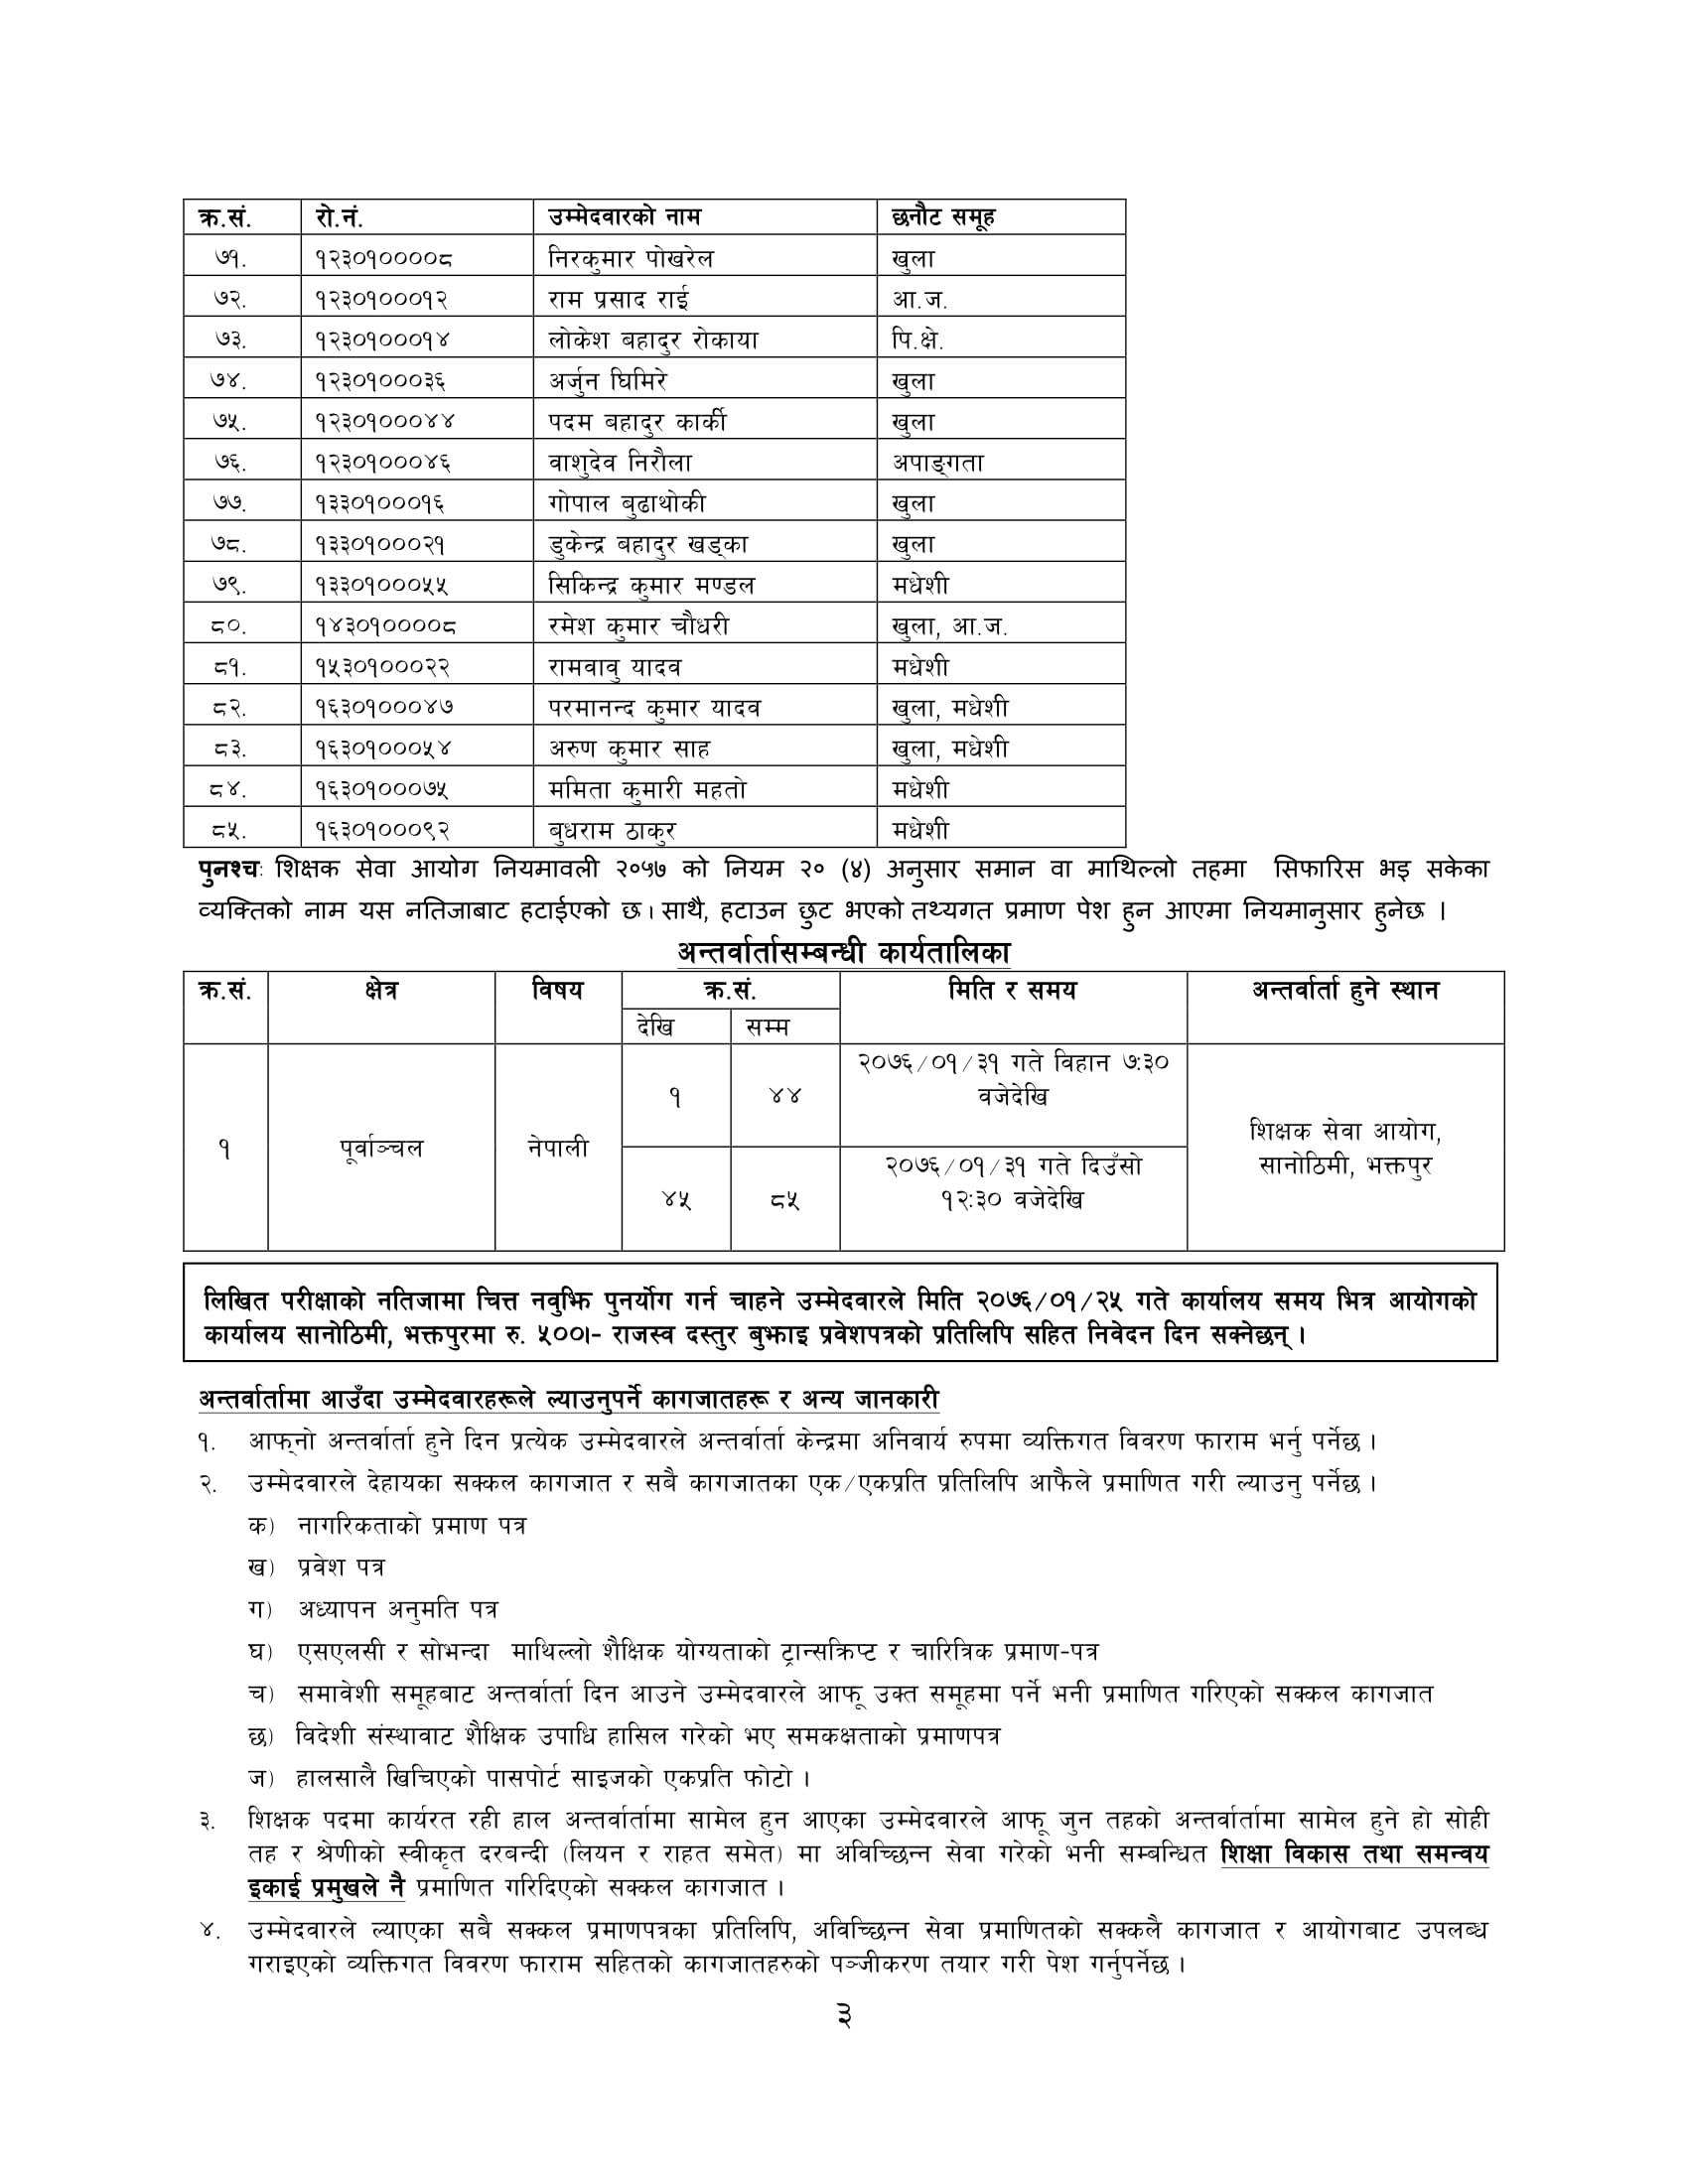 purbaanchan tsc nepali subject result,  tsc result purbanchal, purbaanchan tsc result,  tsc nepali result purbanchal,  TSC exam result, shikshak sewa aayog natija, temporary teachers result, TSC exam result, TSC internal exam result, TSC Nepal 2075 Internal Exam Result, tsc result, tsc result 2075, tsc result 2076, tsc secondary result, tsc lower secondary result, tsc primary level result, tsc Nepal exam result, शिक्षक नतिजा, नतिजा, शिक्षक नतिजा २०७५